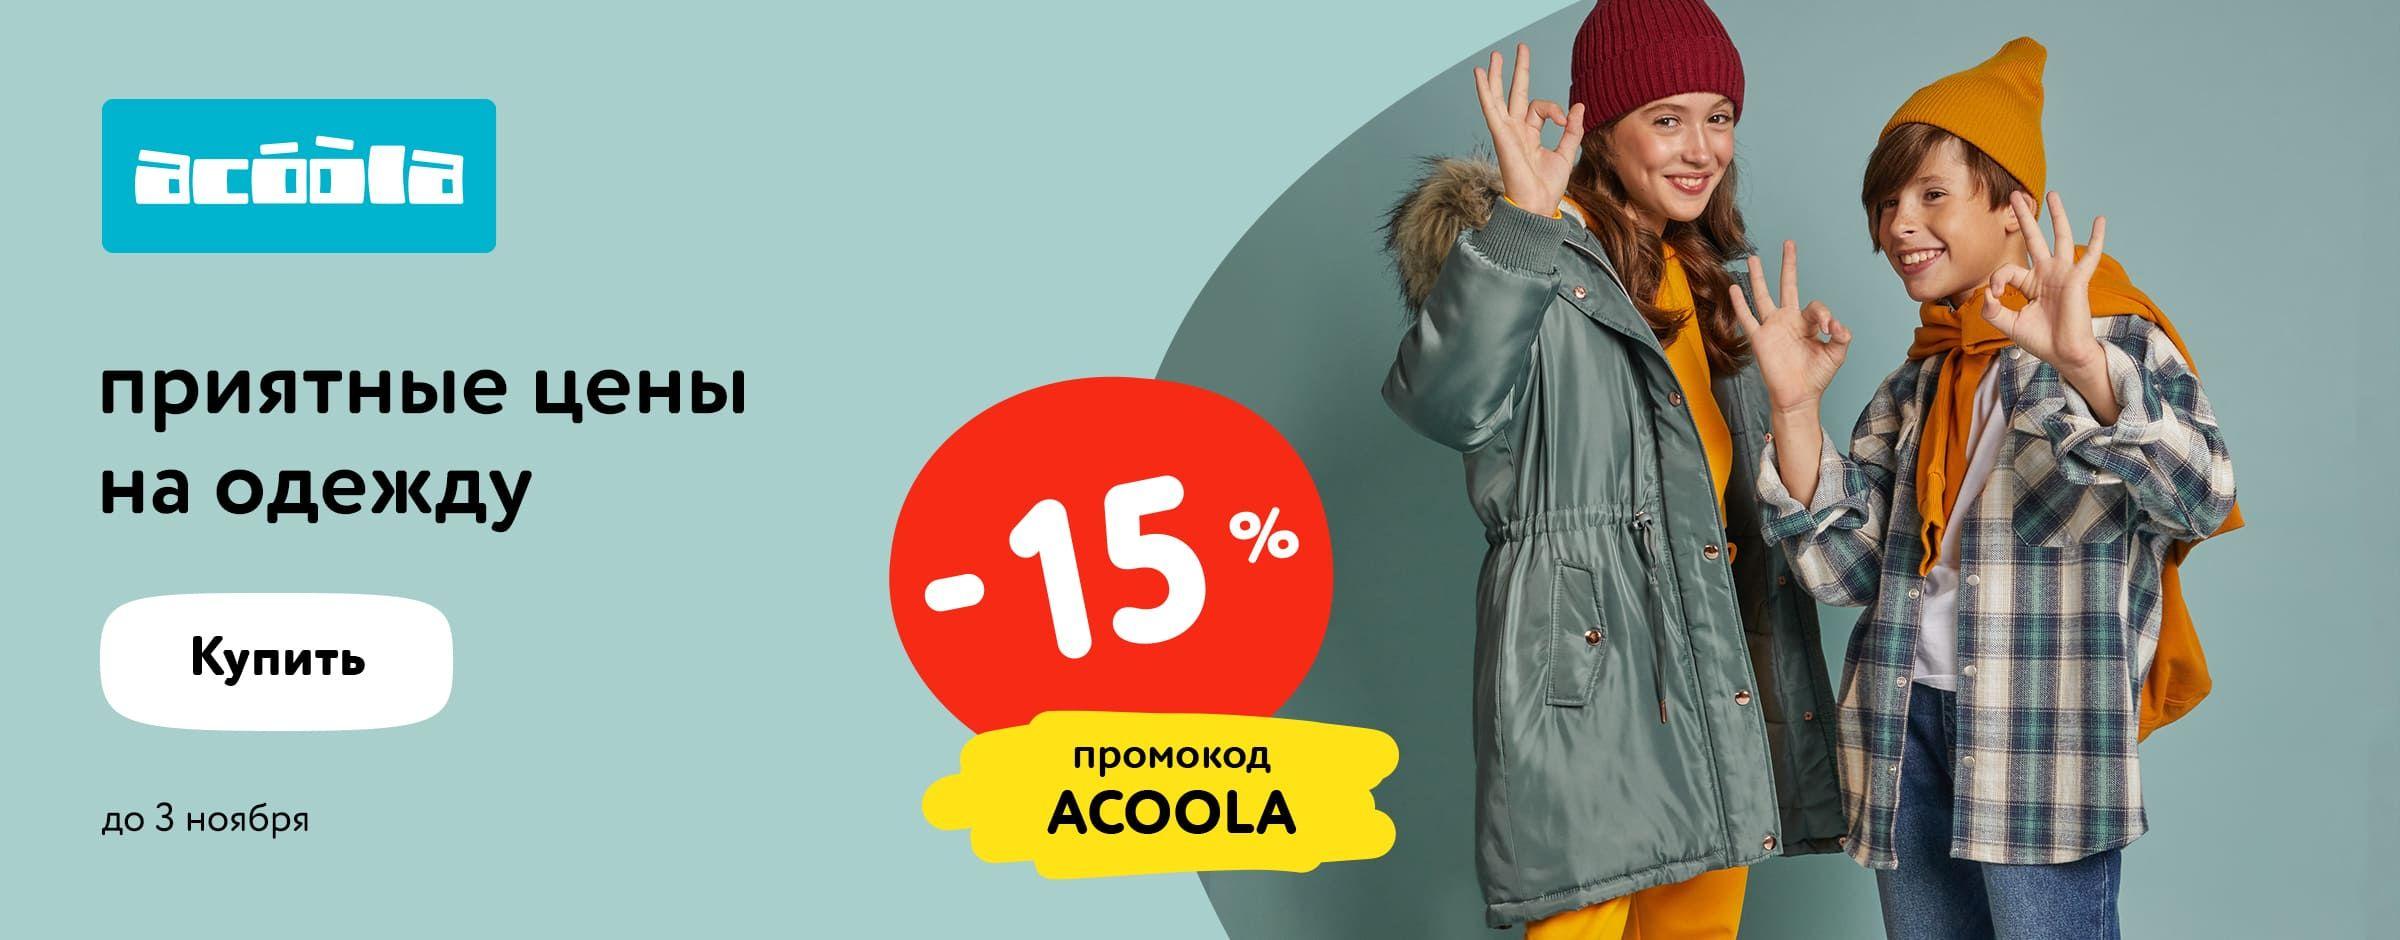 Скидка 15% на детскую одежду бренда Acoola по промокоду ACOOLA